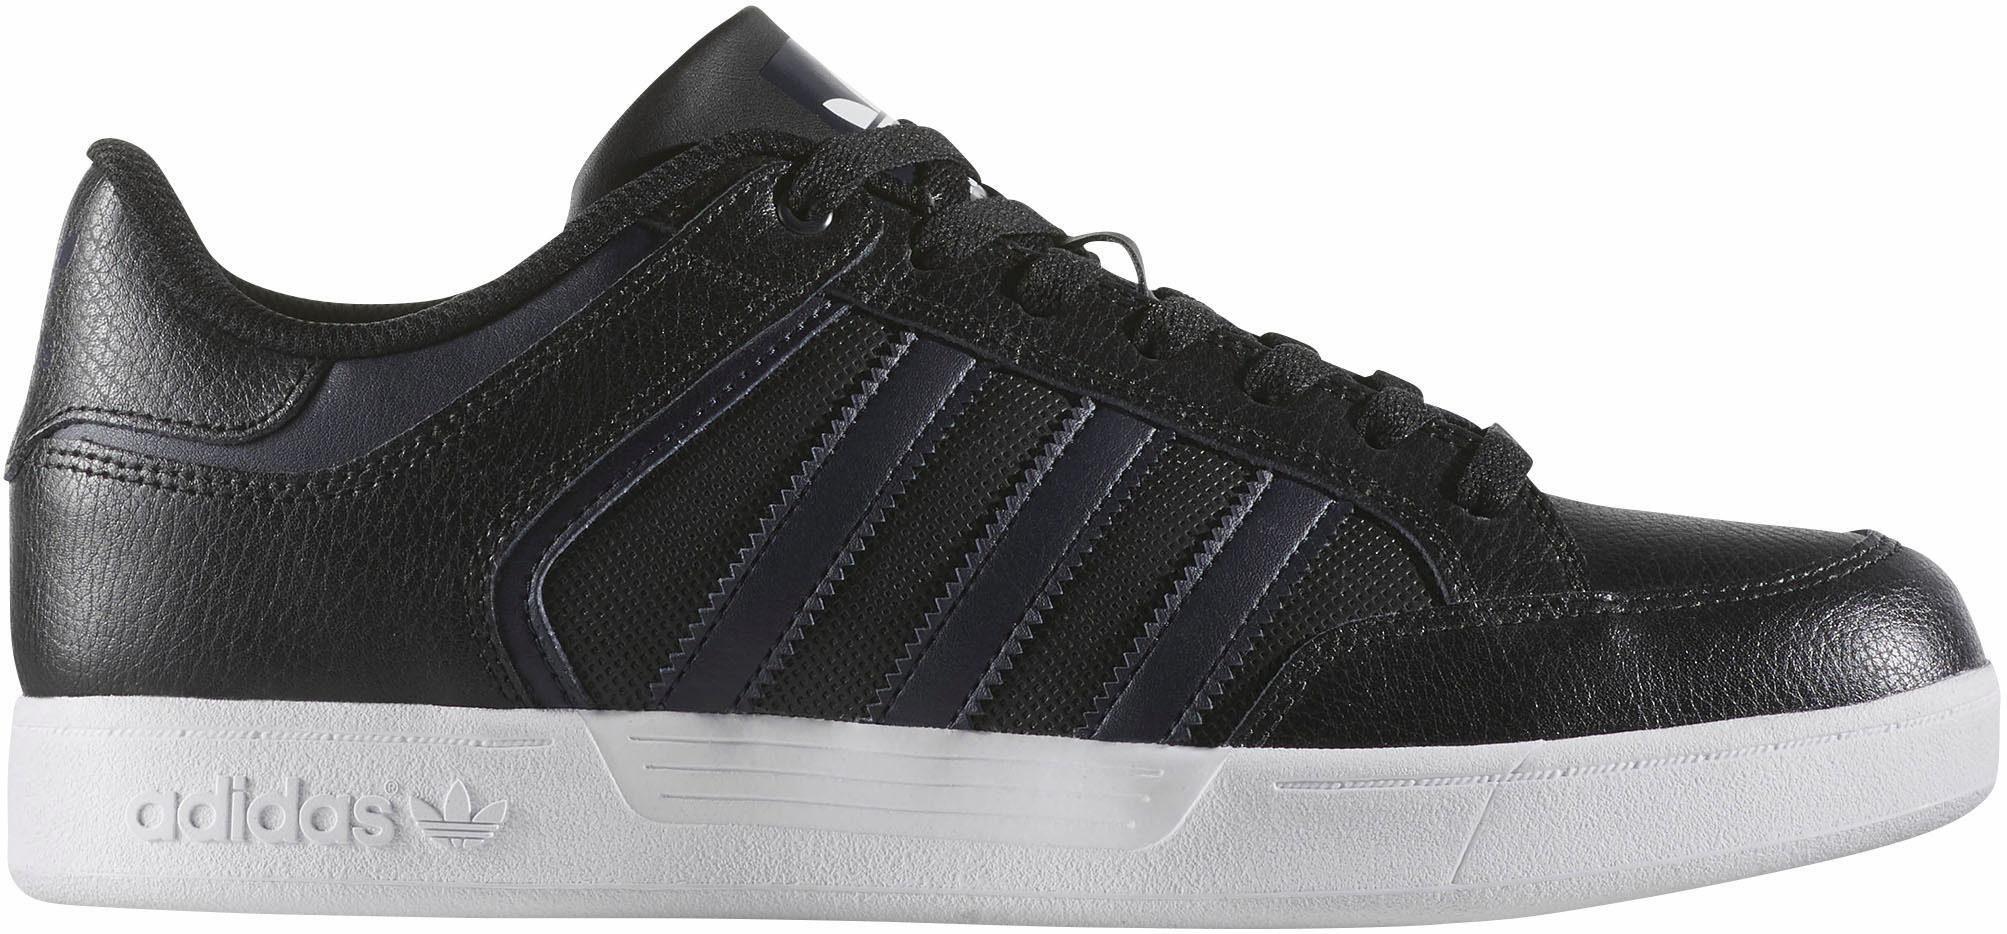 Originaux Adidas Sneakers Couche Varial Basse M « Noir YwUuj1v3a